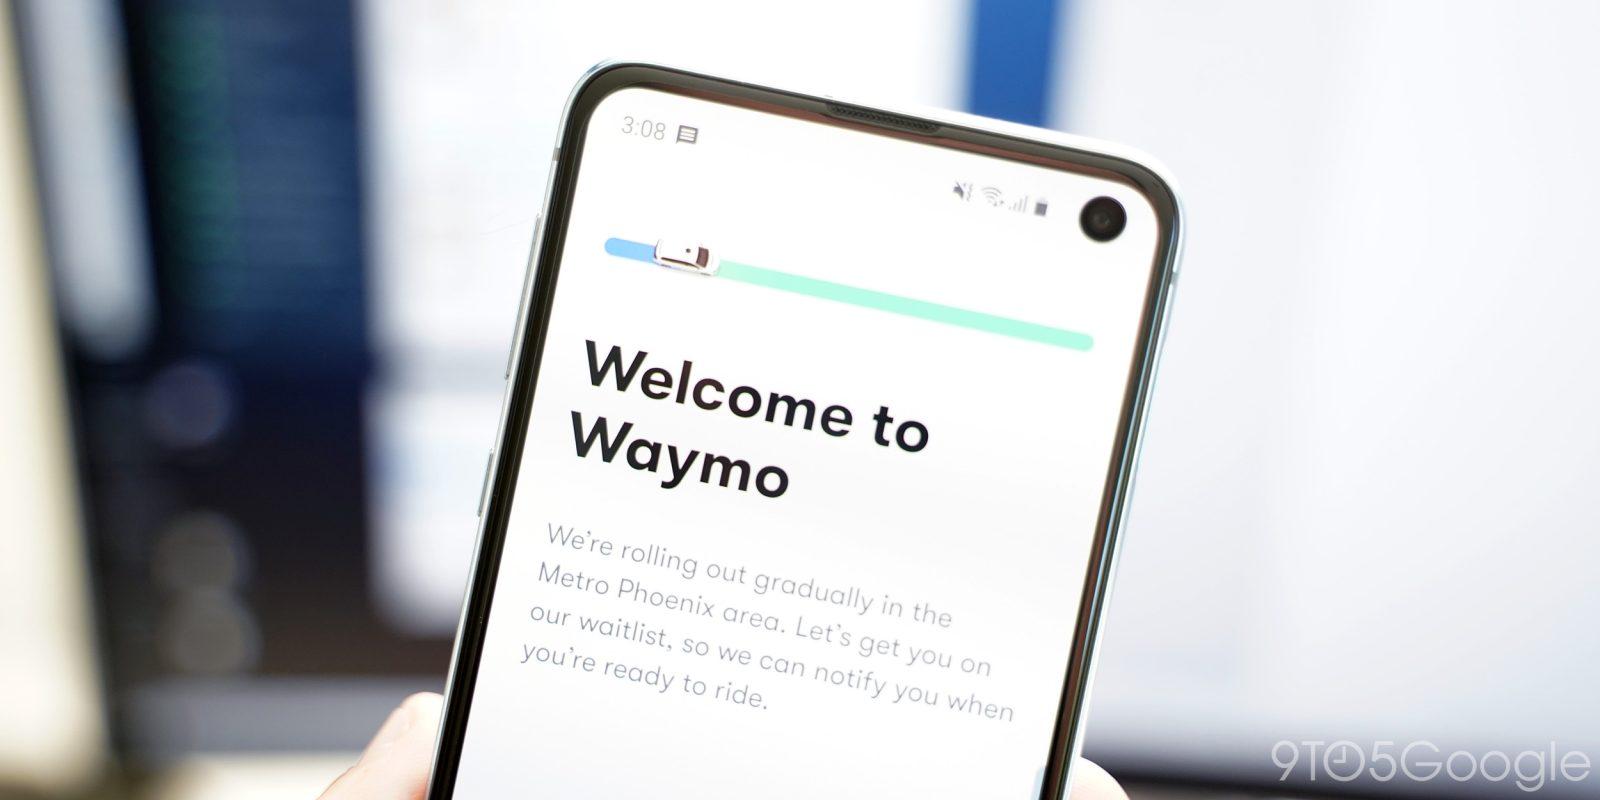 QnA VBage Waymo app reveals Bluetooth door unlock, Play Music & Google Calendar integration [APK Insight]